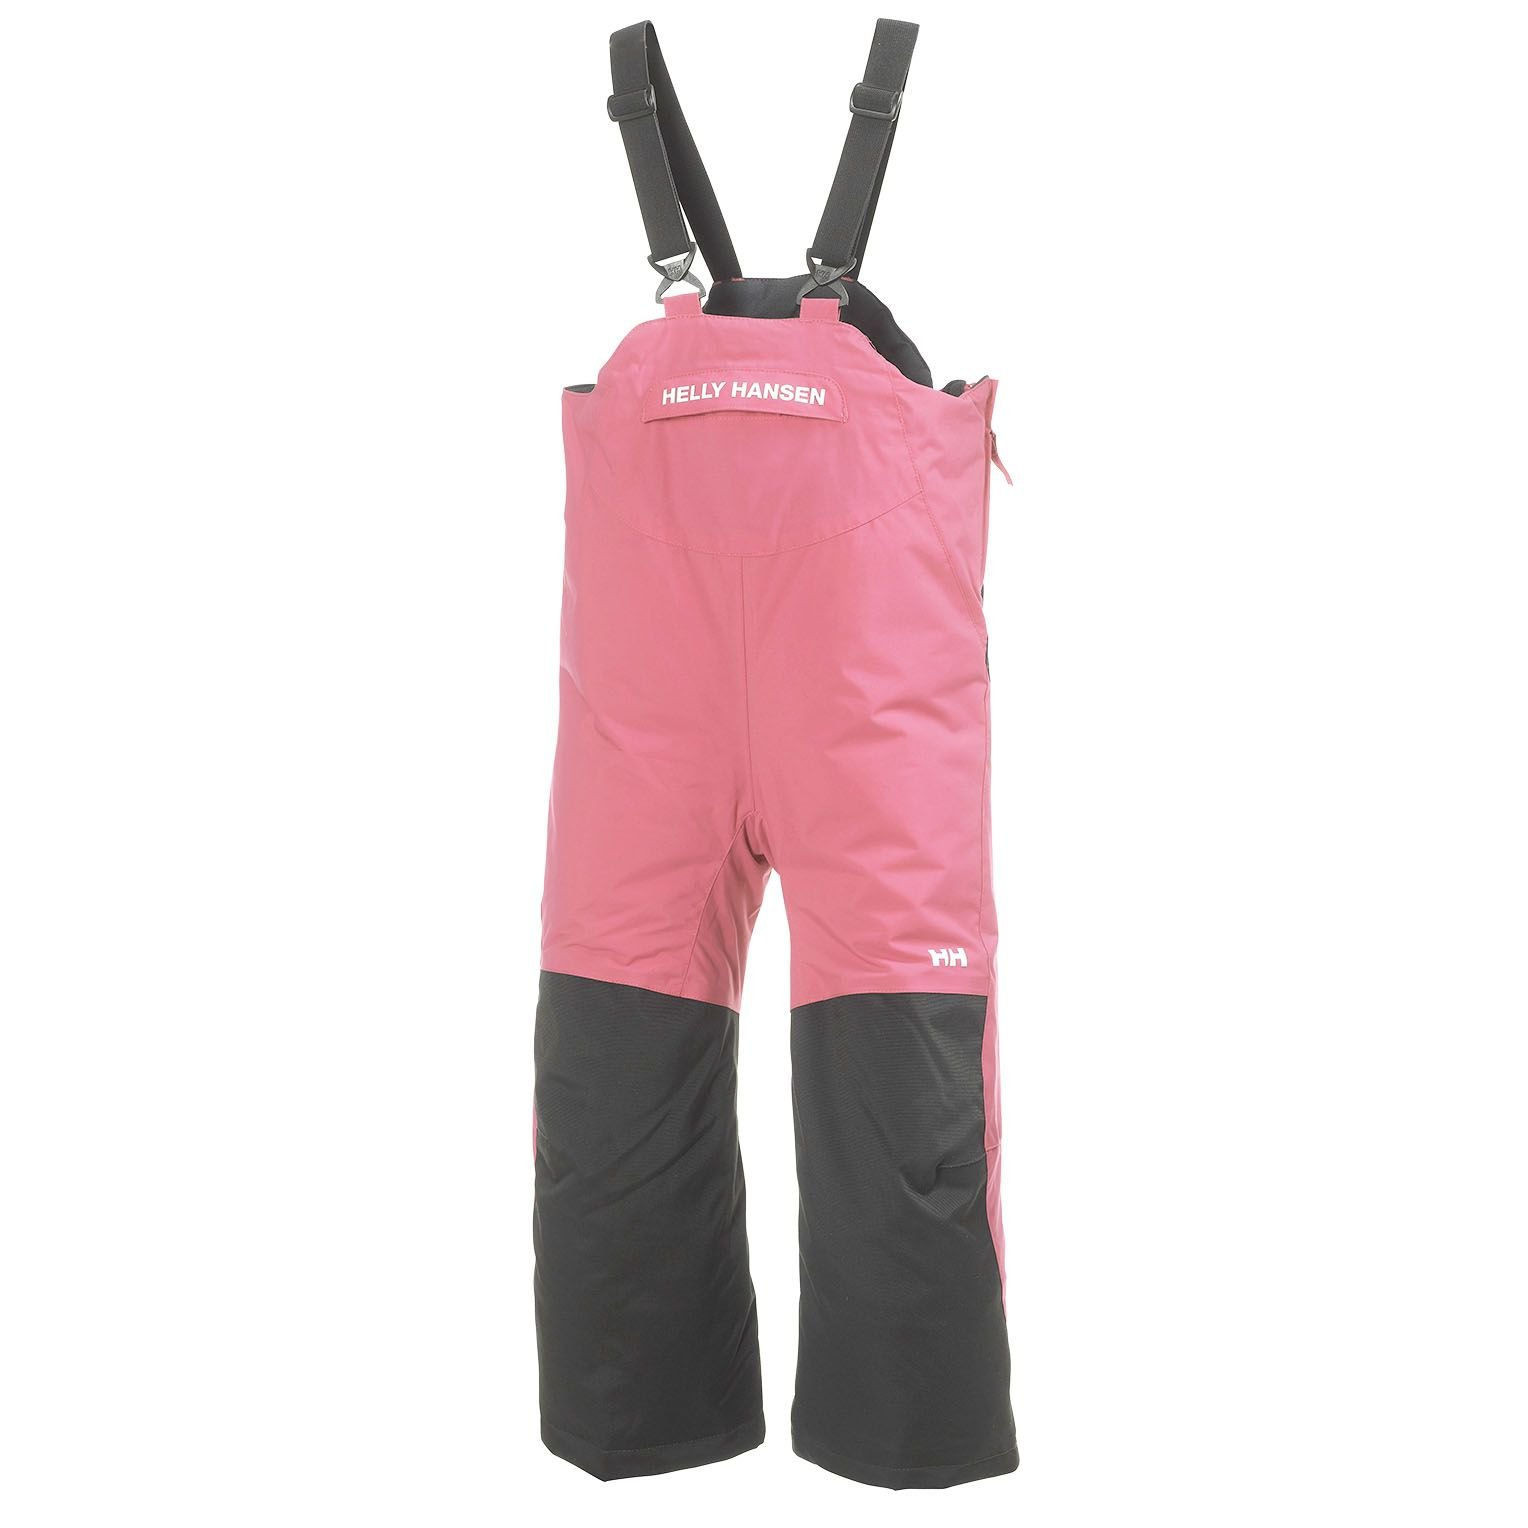 Helly Hansen Kids Rider Insulated Bib Pants, Dusty Powder, Size 7